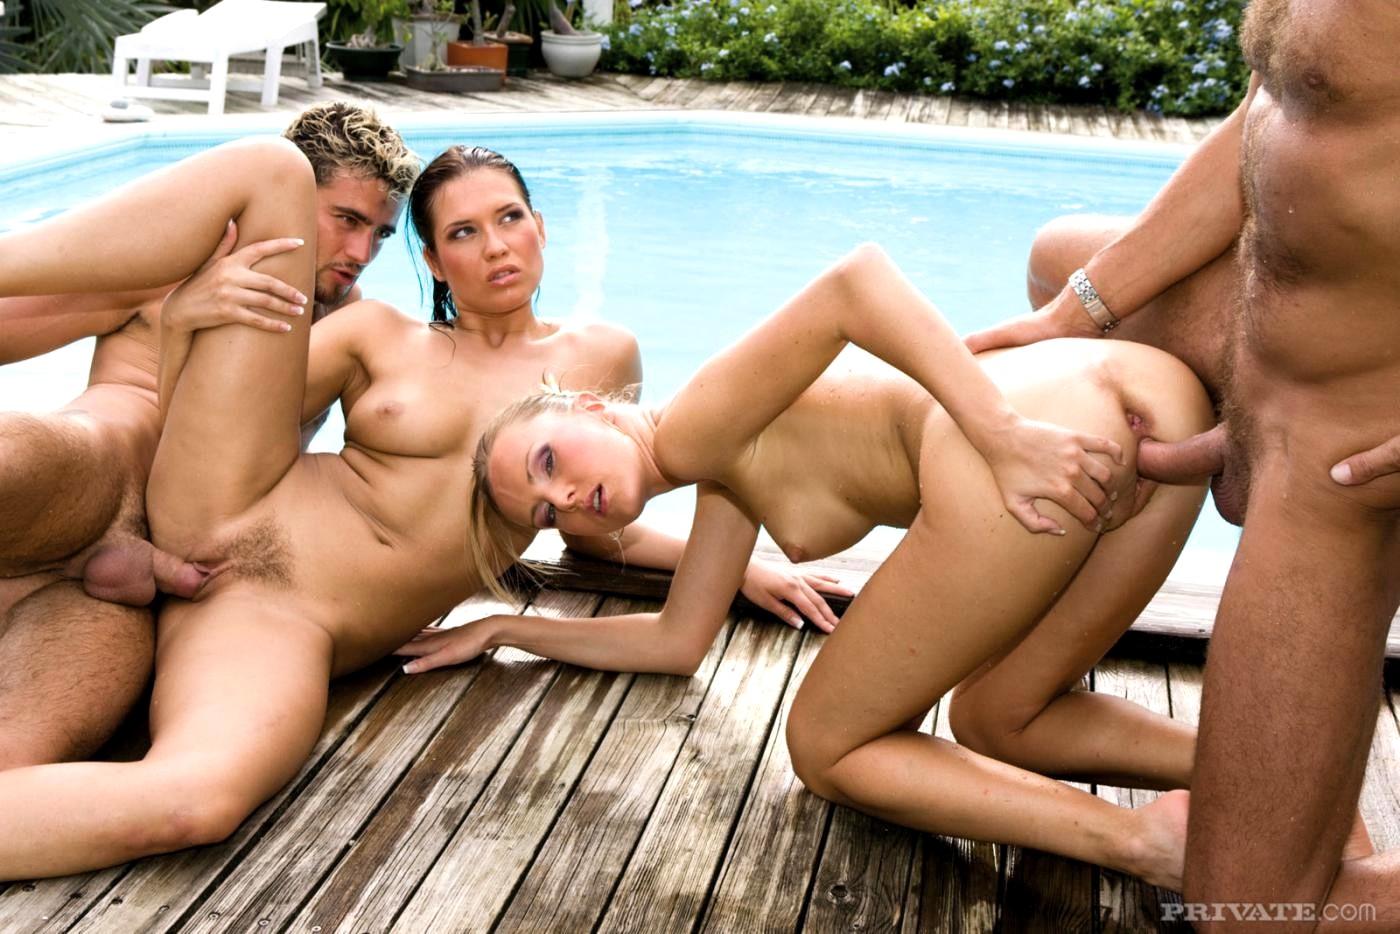 Download Photo Mia Khalifa Swi Mming Pool Fuck Anal Porn Big Anal Porn Big Cock Alberca Pene Grande